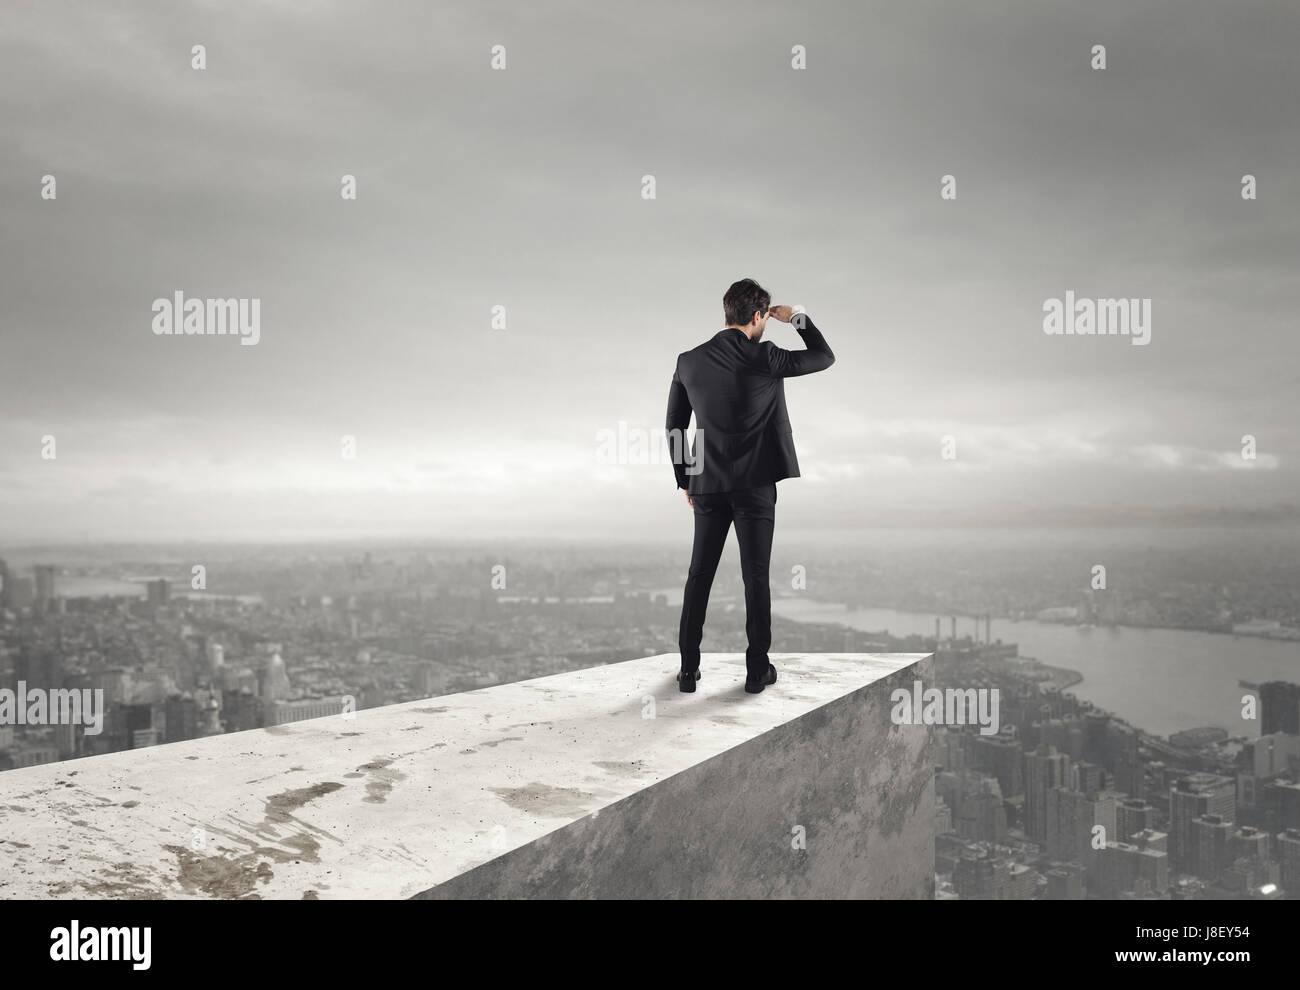 Regarder vers l'avenir Photo Stock